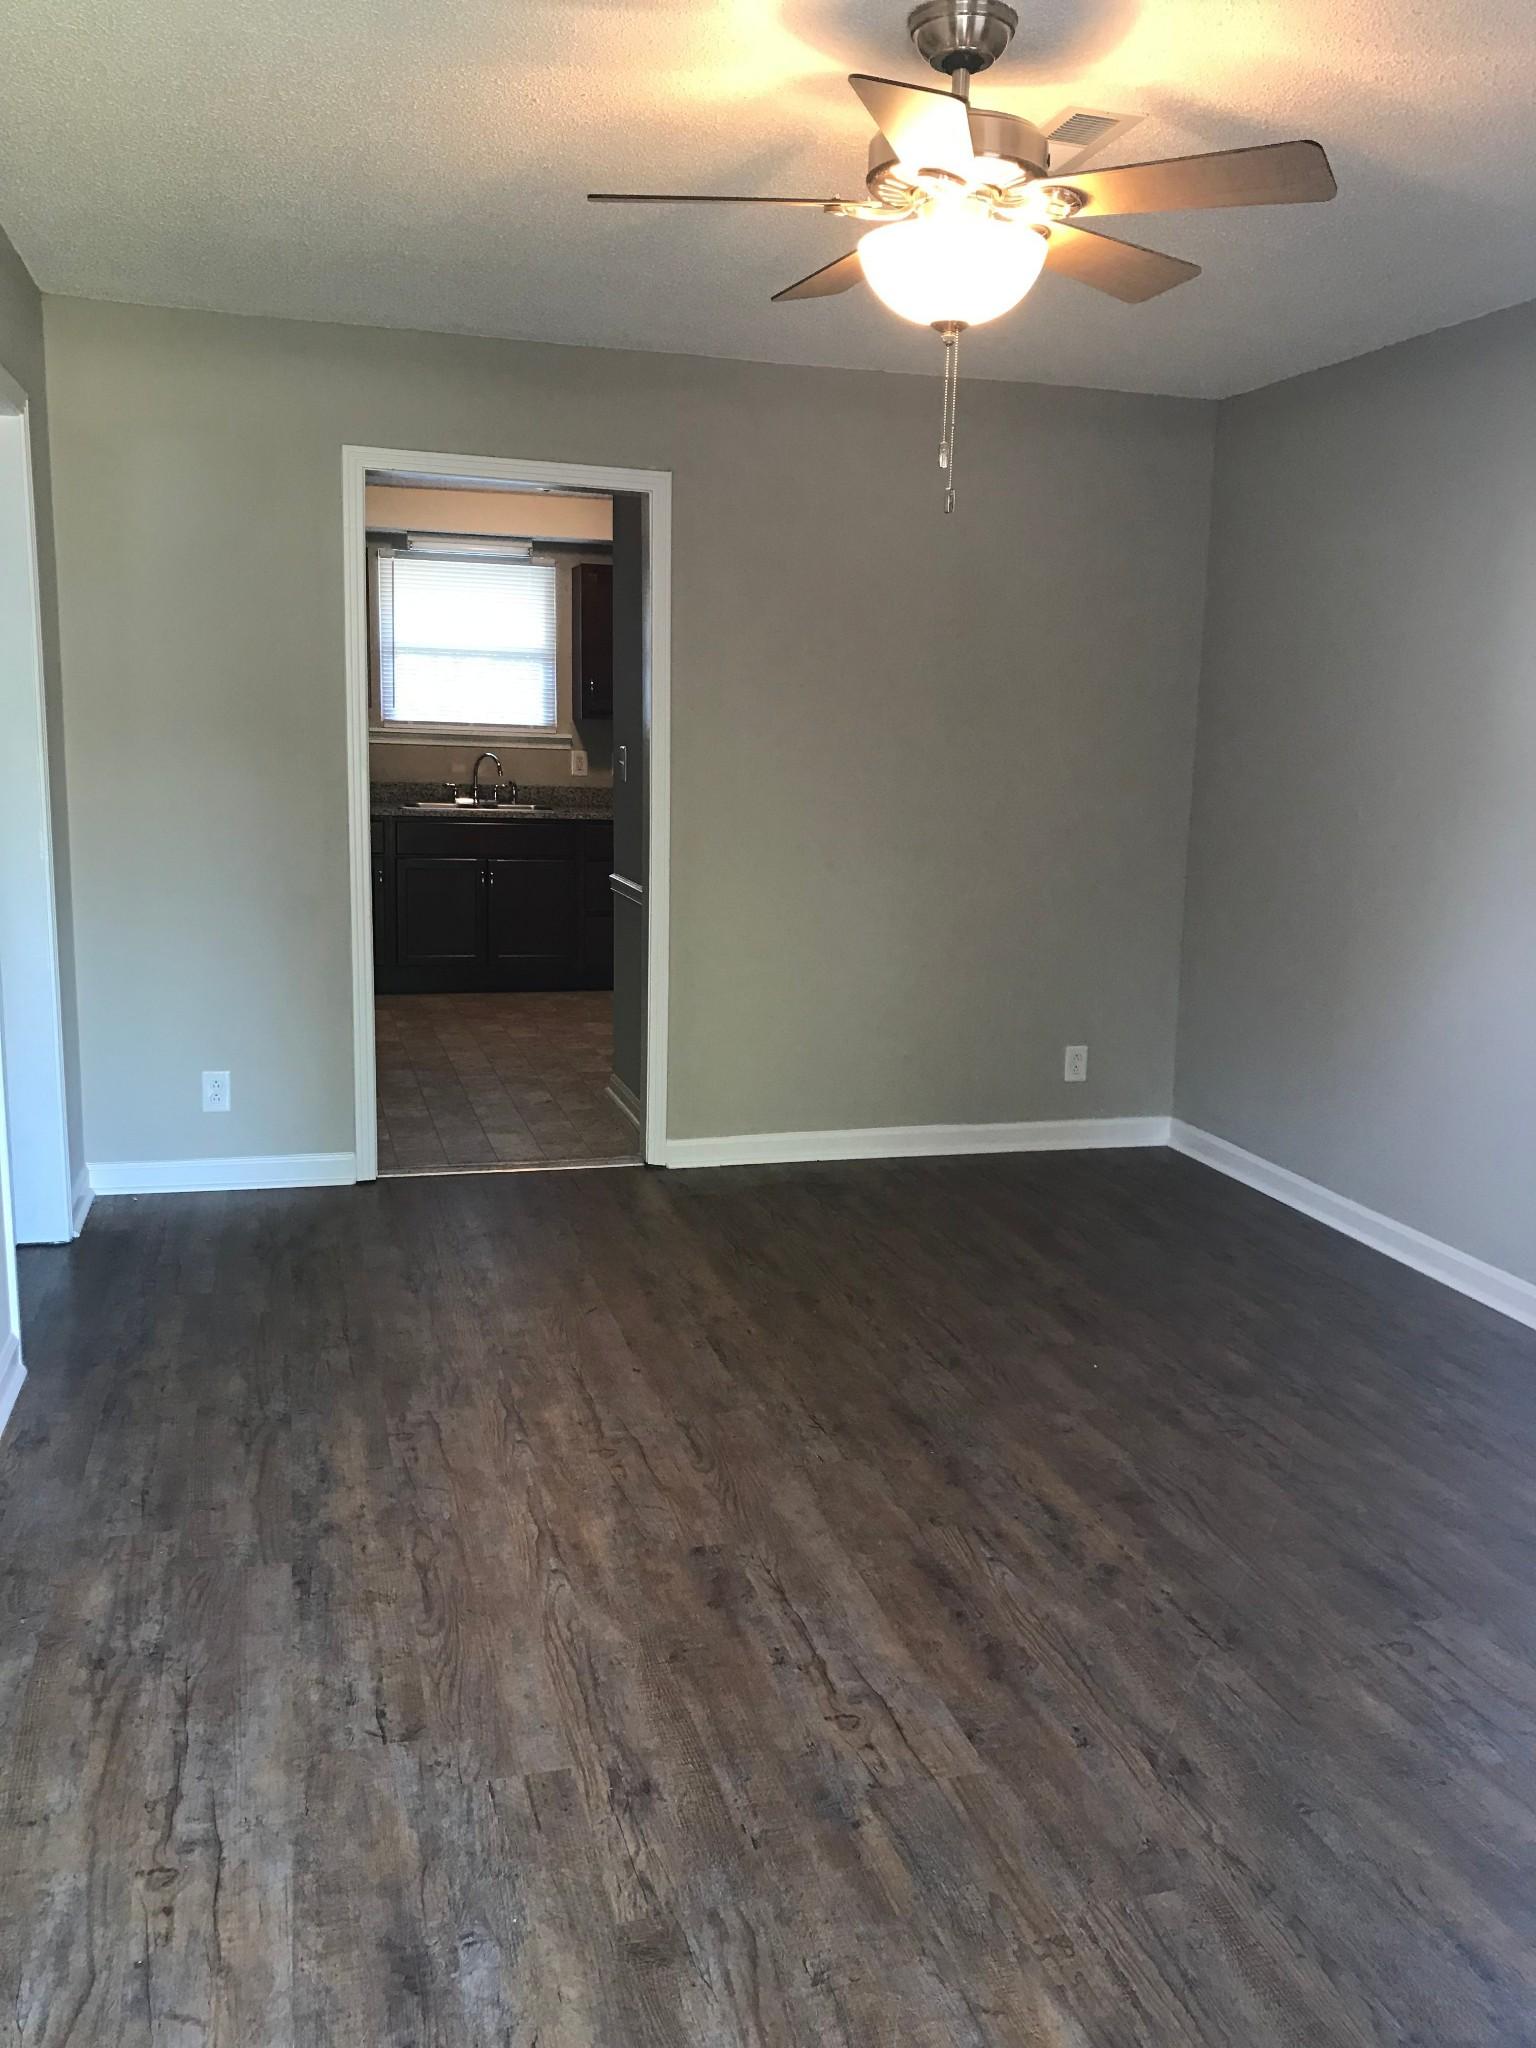 624 R S Bradley Blvd. Property Photo - Clarksville, TN real estate listing